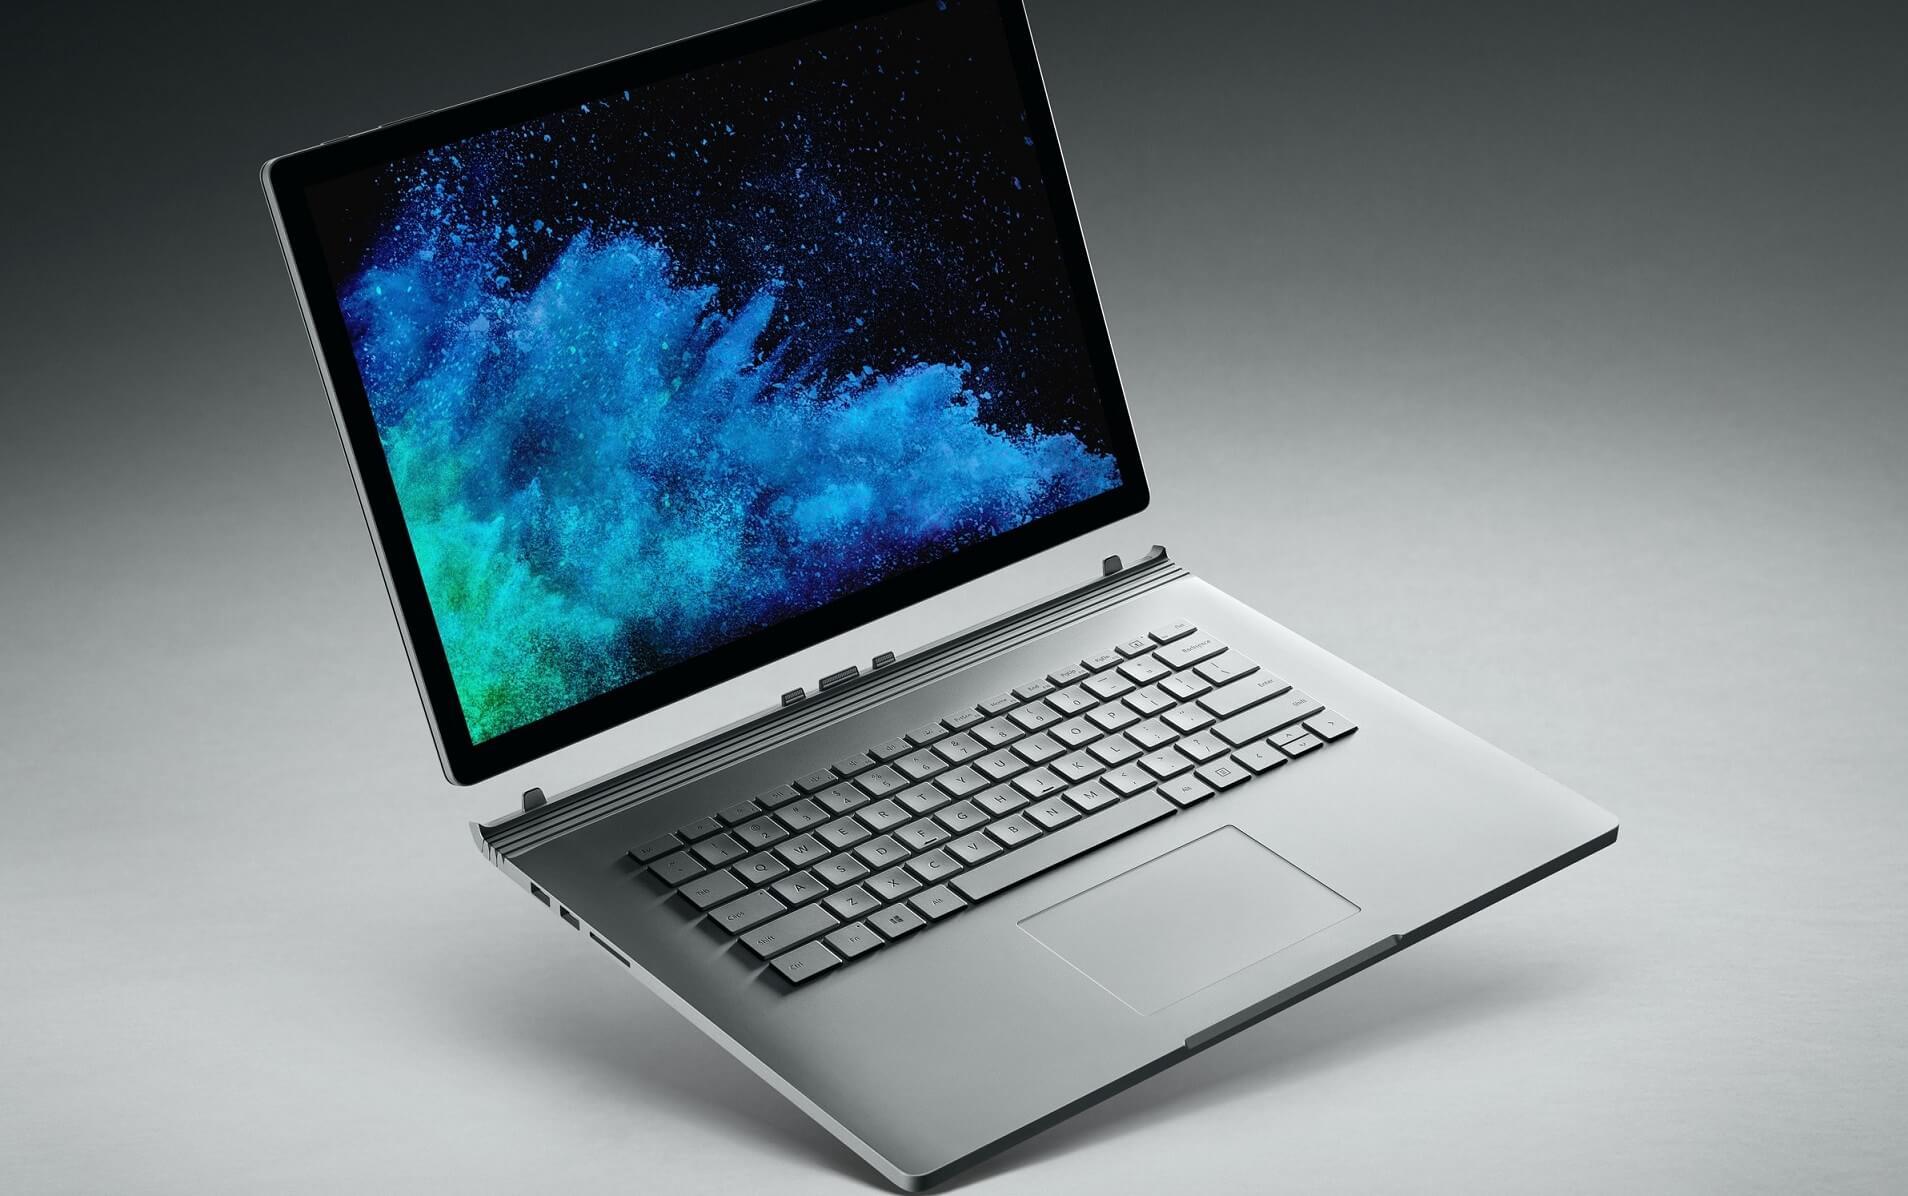 Surface Book 2 render